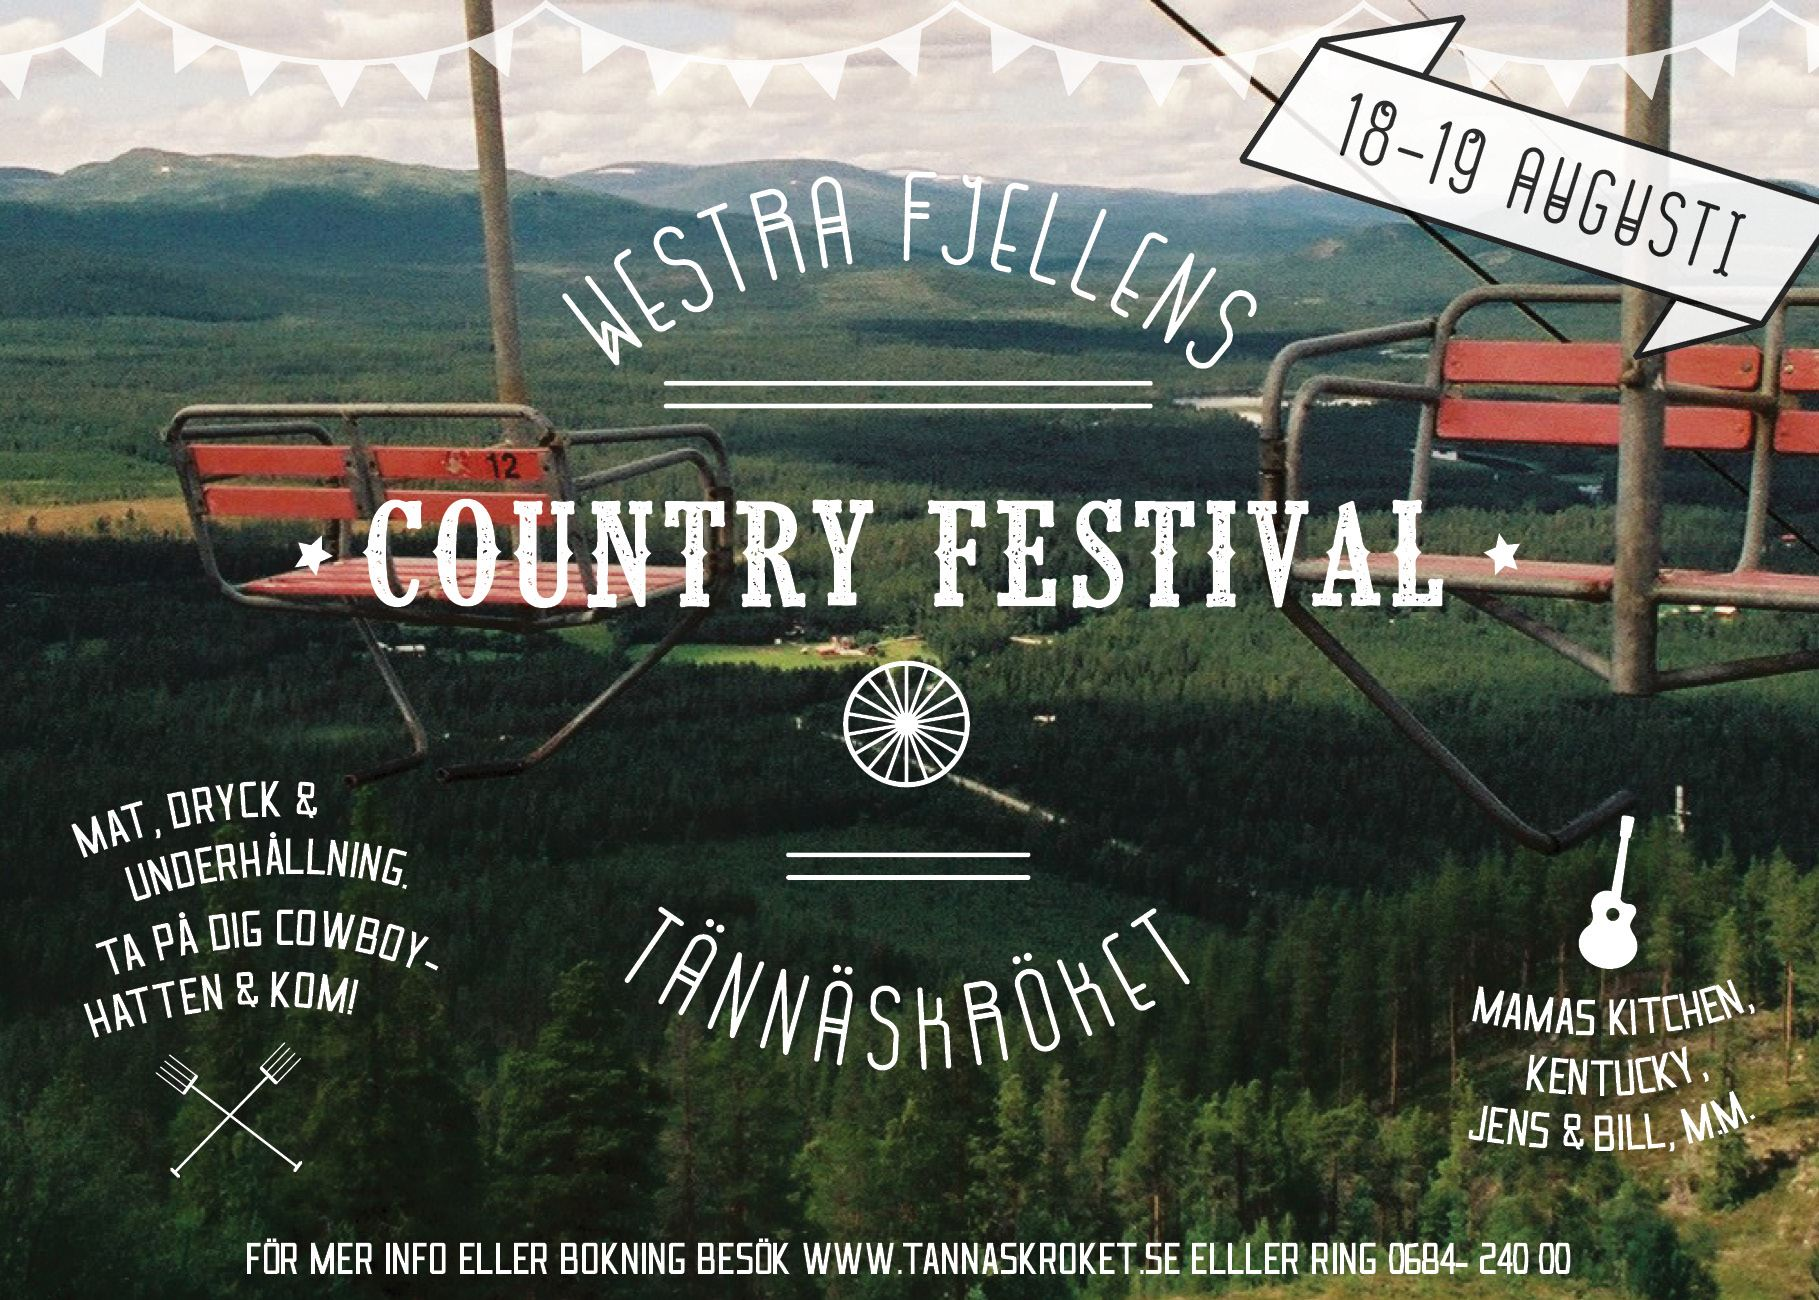 Tännäs Countryfestival 18-19 augusti